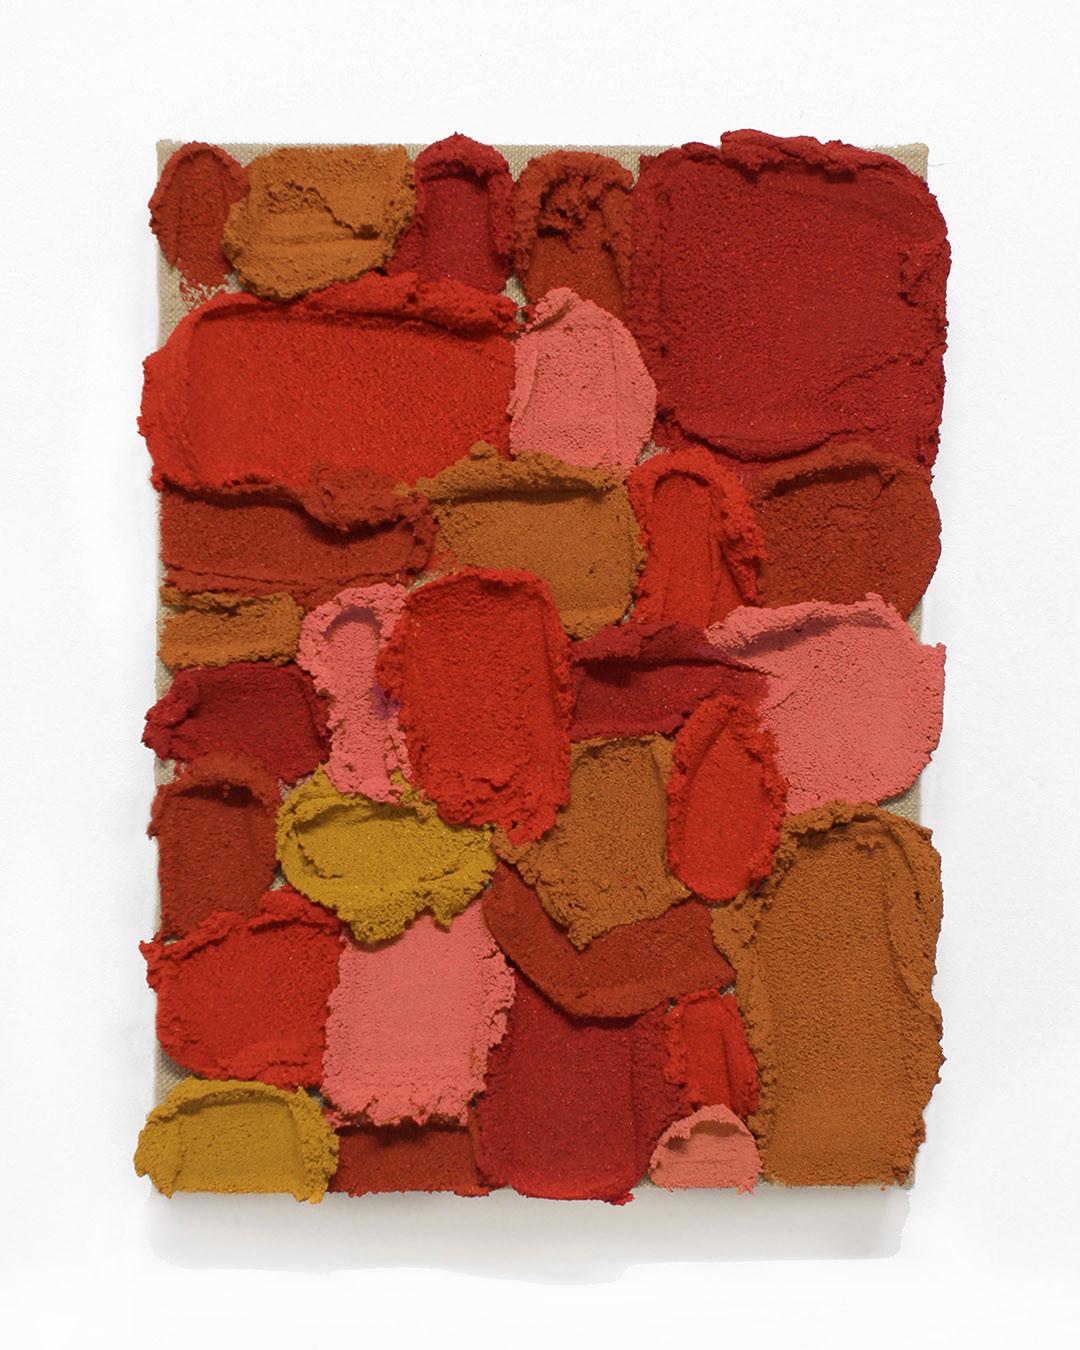 PR31, 2020. Acrylic, sand and limestone on linen. 33 x 24 cm.